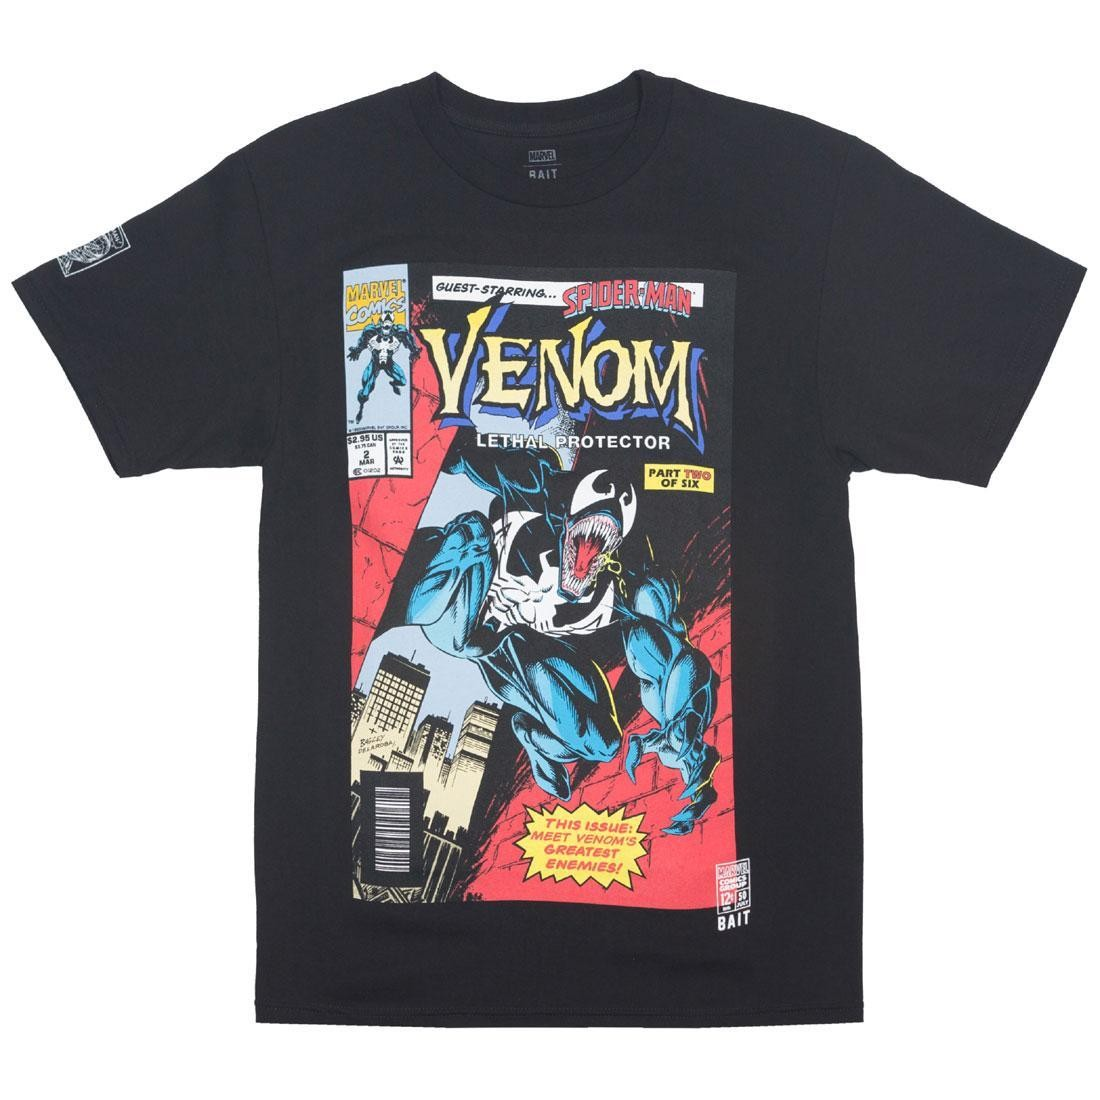 BAIT x Marvel Men Venom Lethal Protector #2 Tee (black)